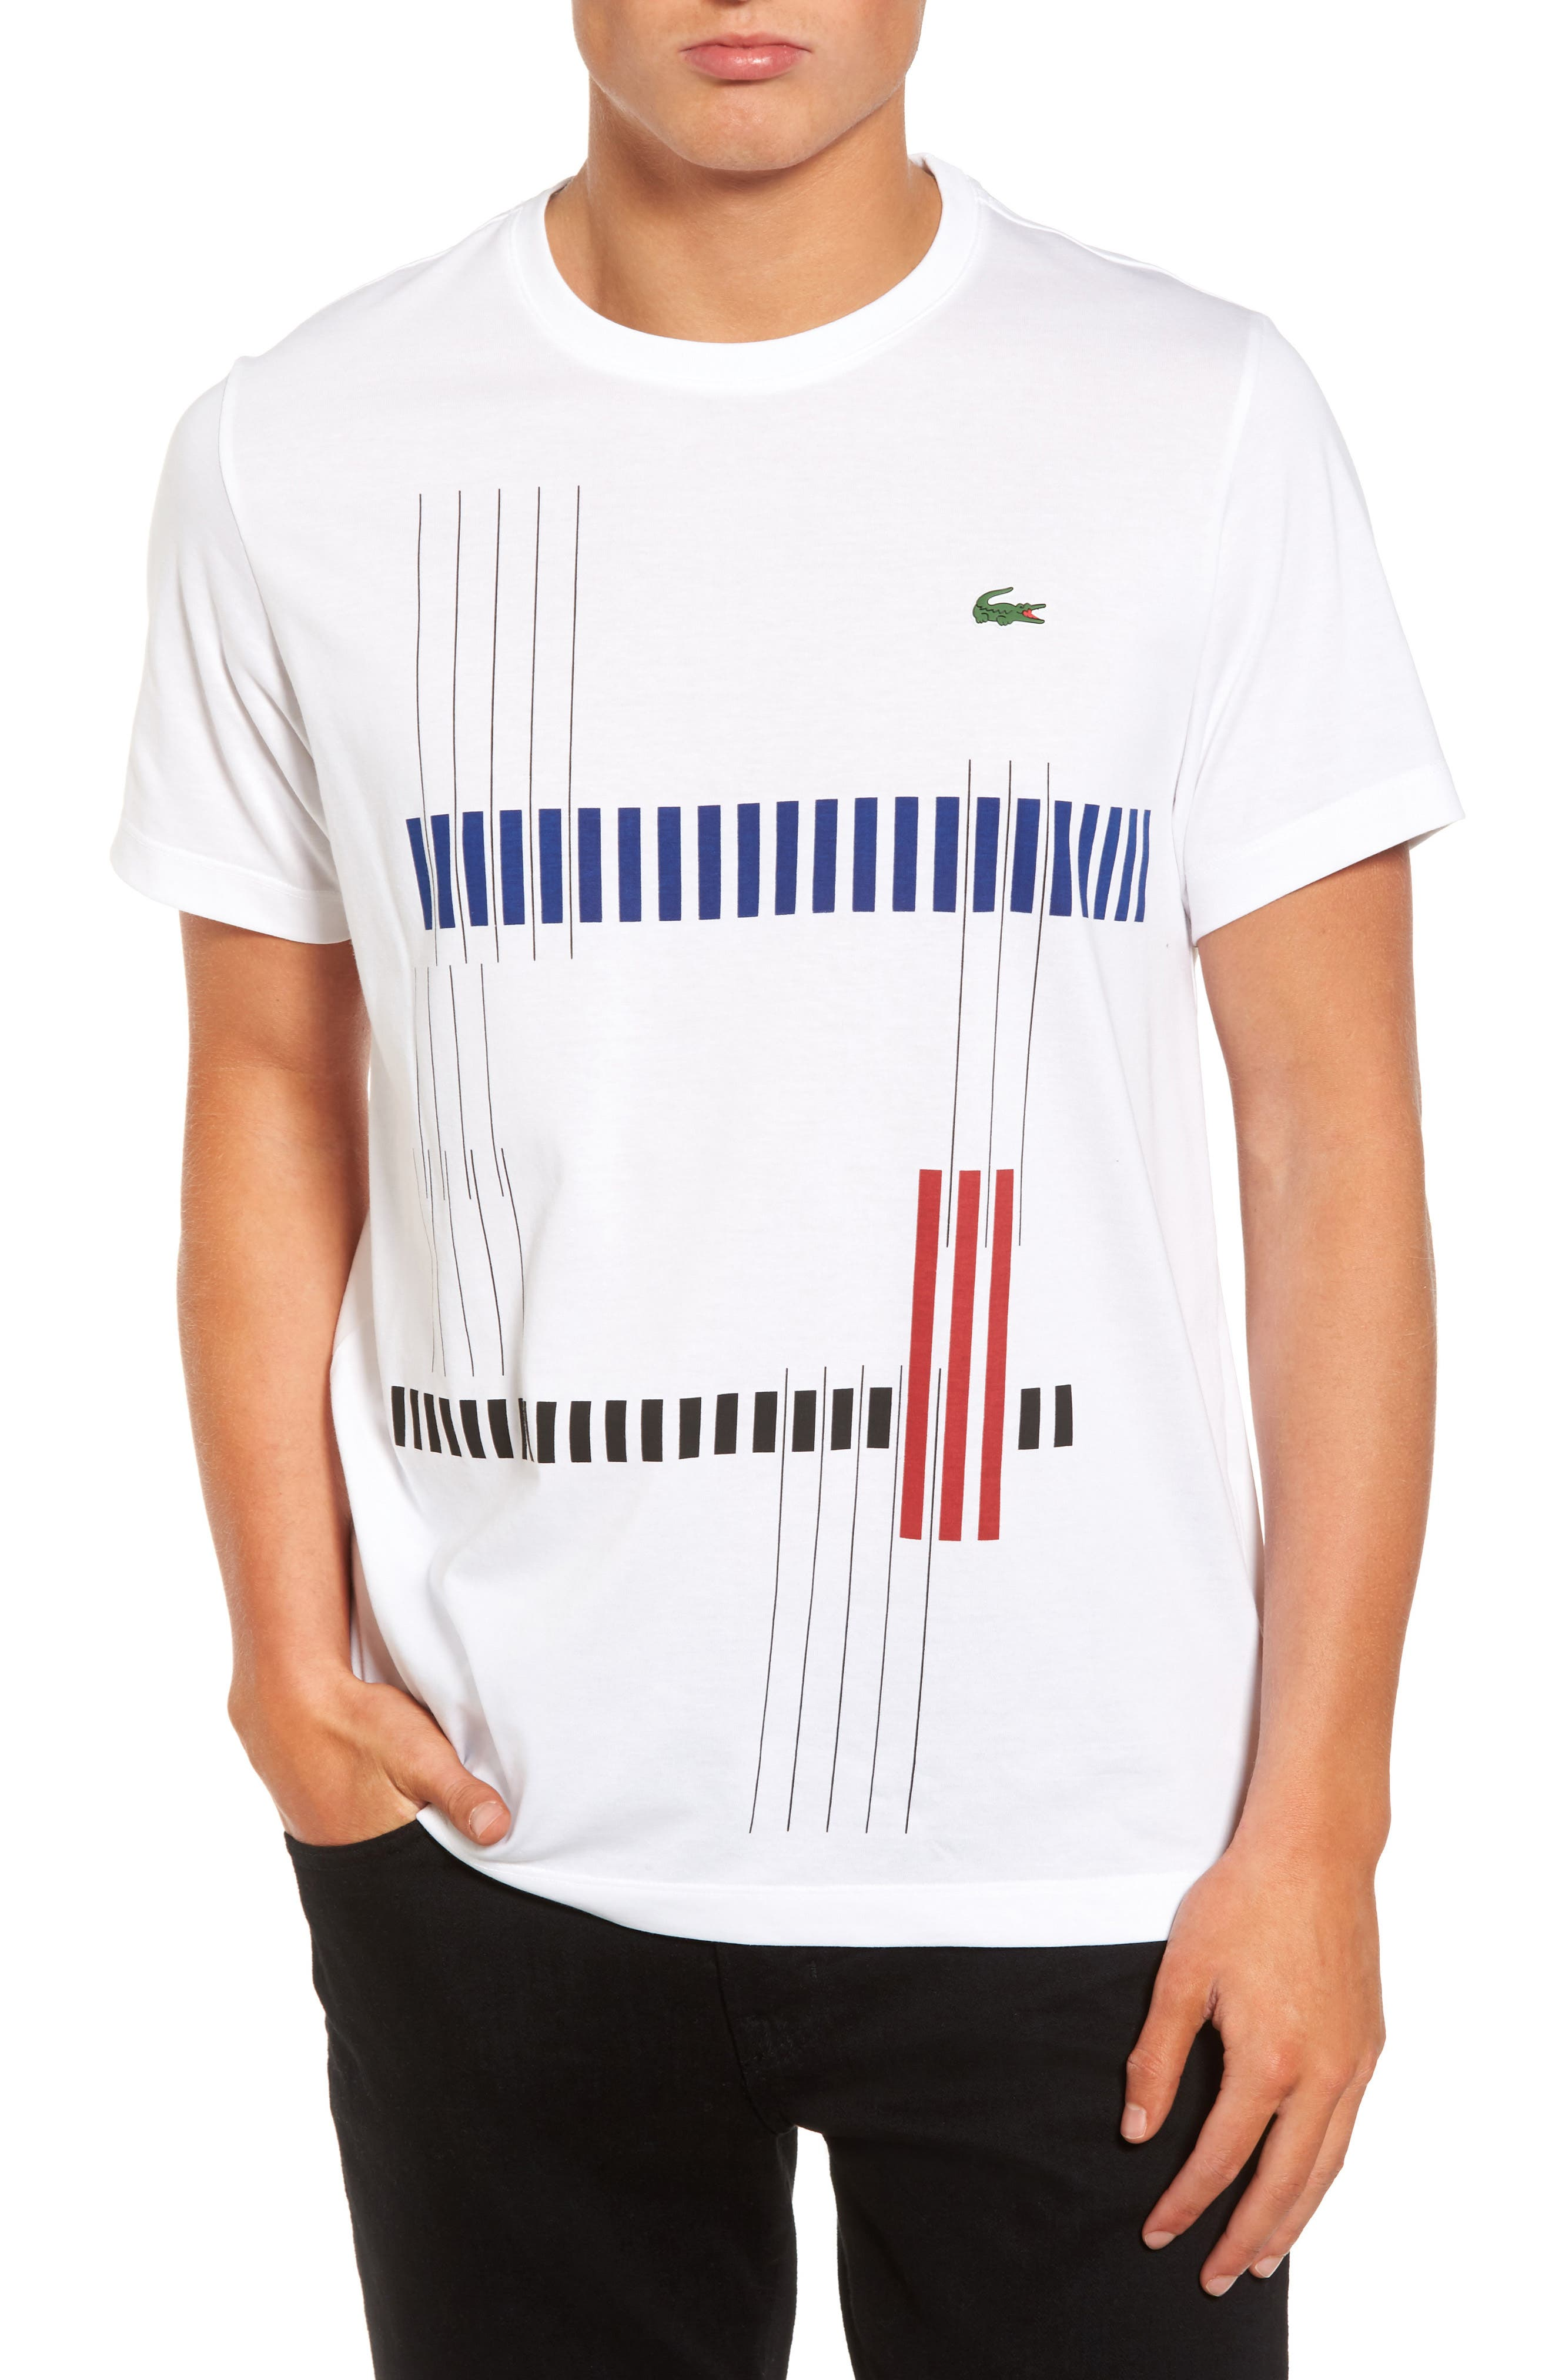 Tech Vertical Stripe Graphic T-Shirt,                         Main,                         color, U88 White/ Ocean-Ladybird-Blac